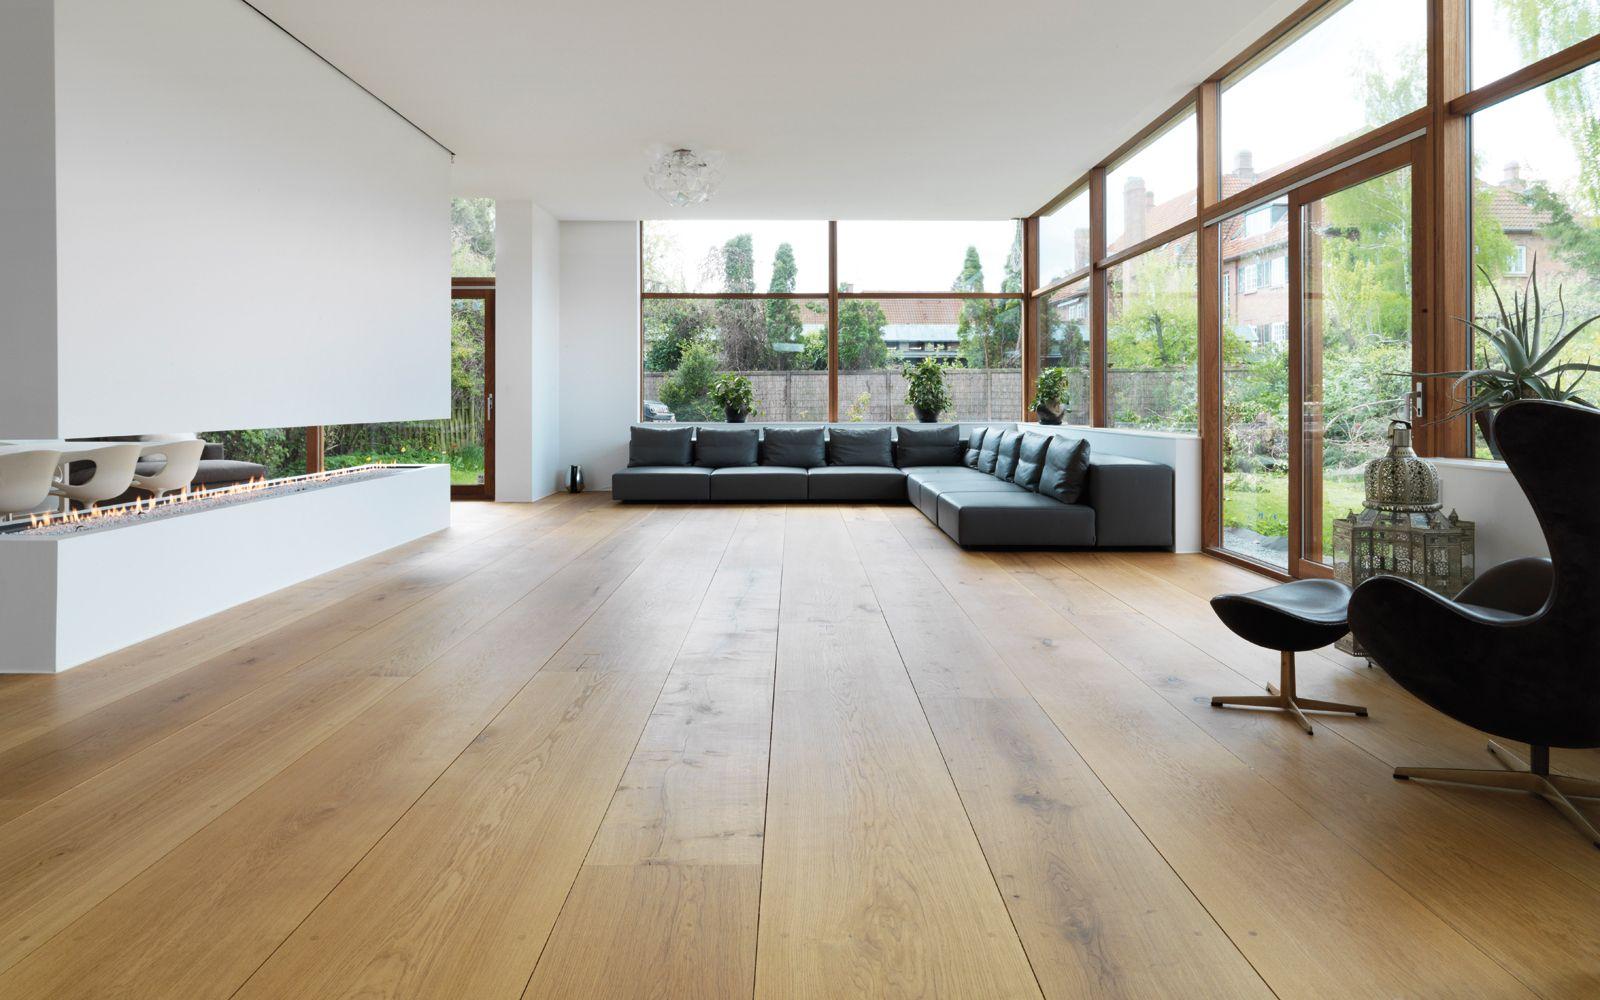 Eiken houten vloer brede en lange planken 30 cm breed en tot 12